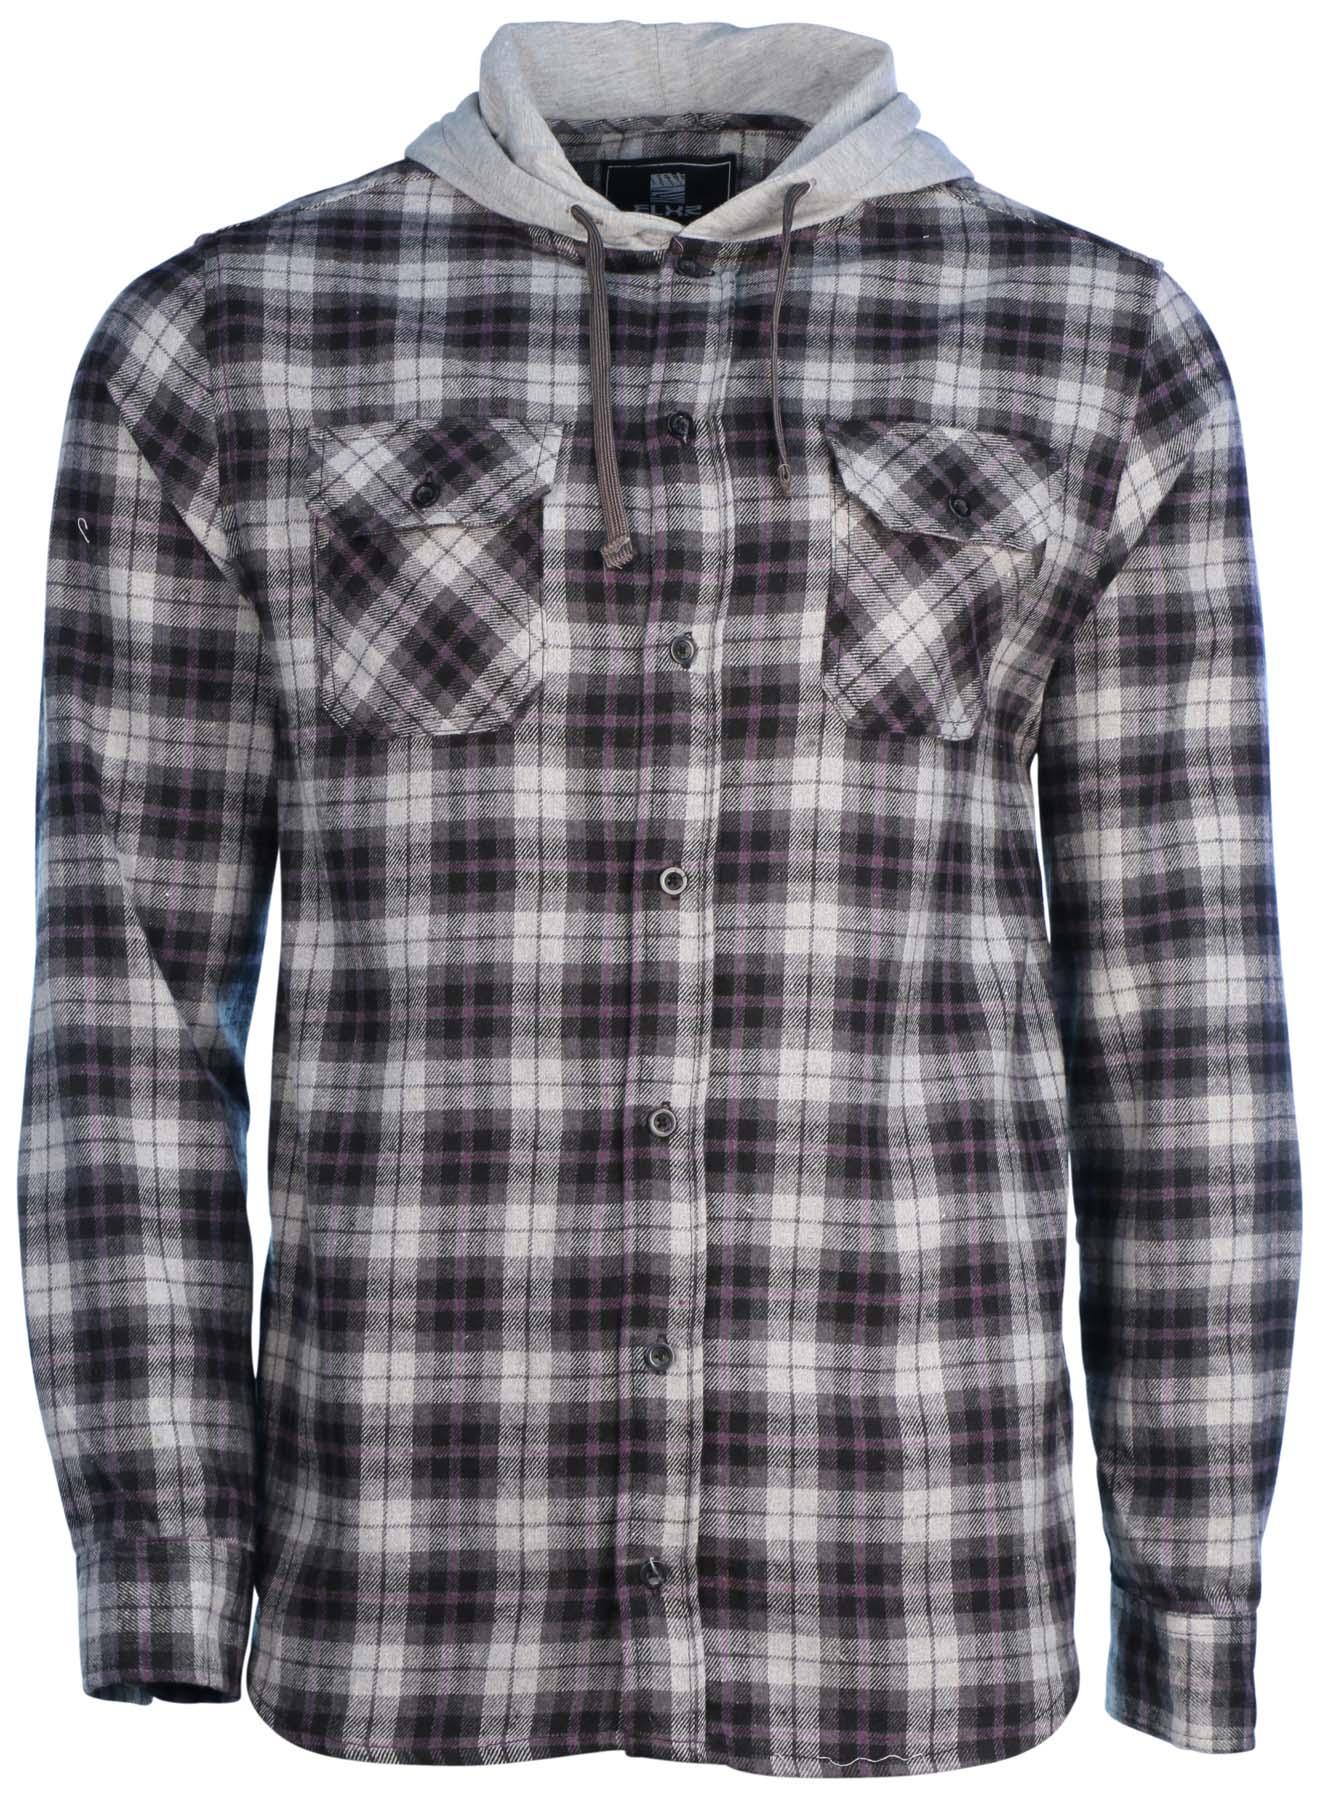 Elixir elxr men 39 s plaid 2 pocket hooded flannel shirt ebay for 9 oz flannel shirt